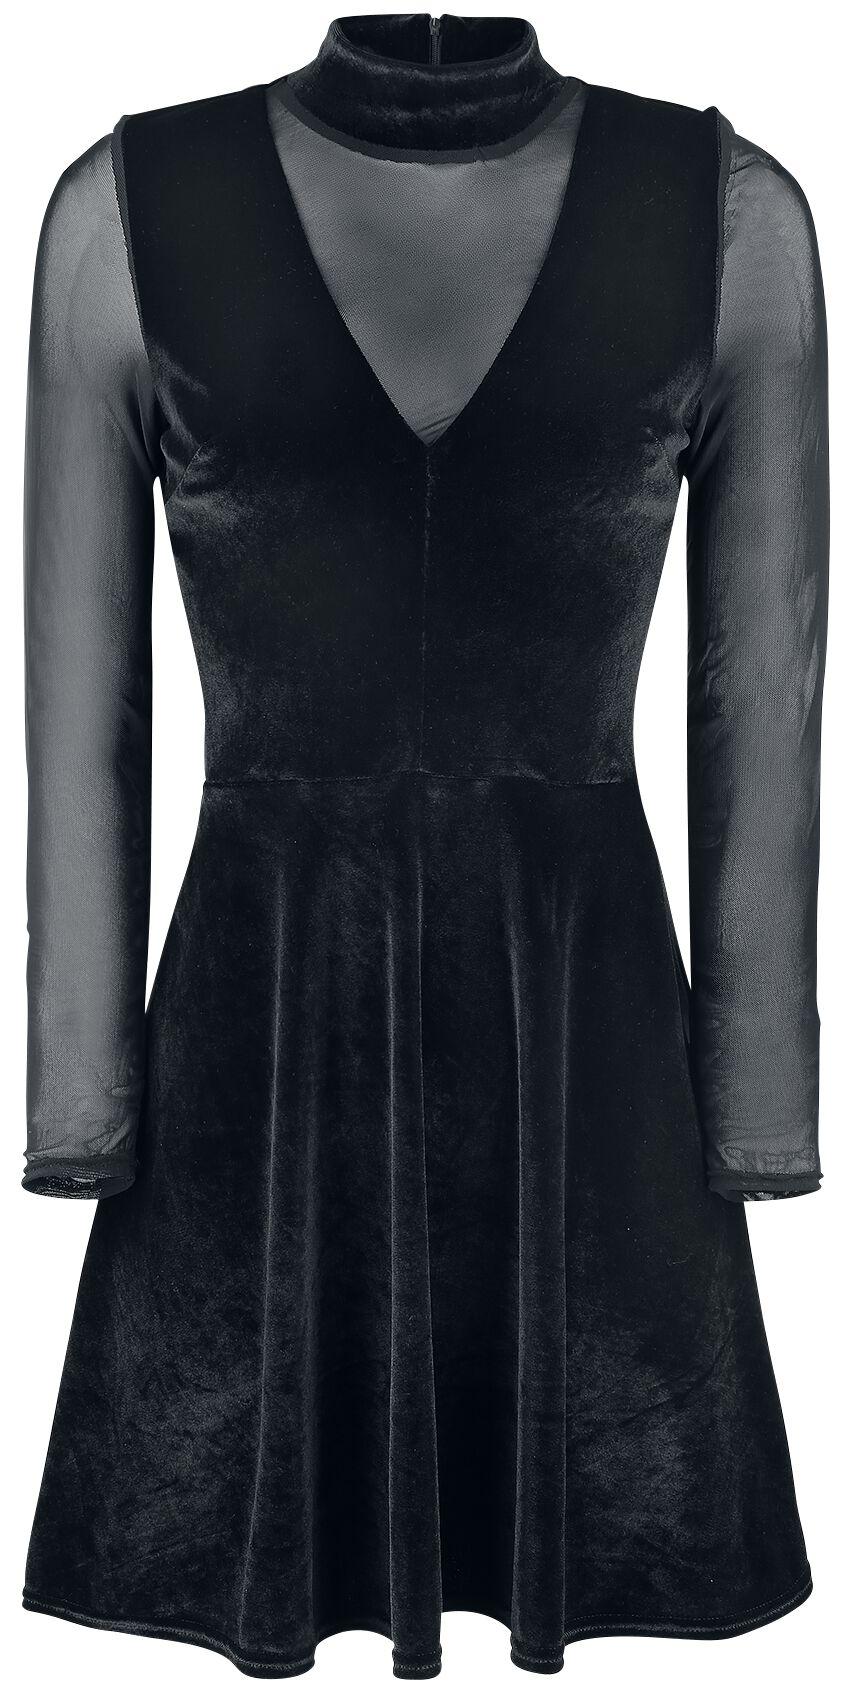 Image of   Fashion Victim Velvet Dress Kjole sort